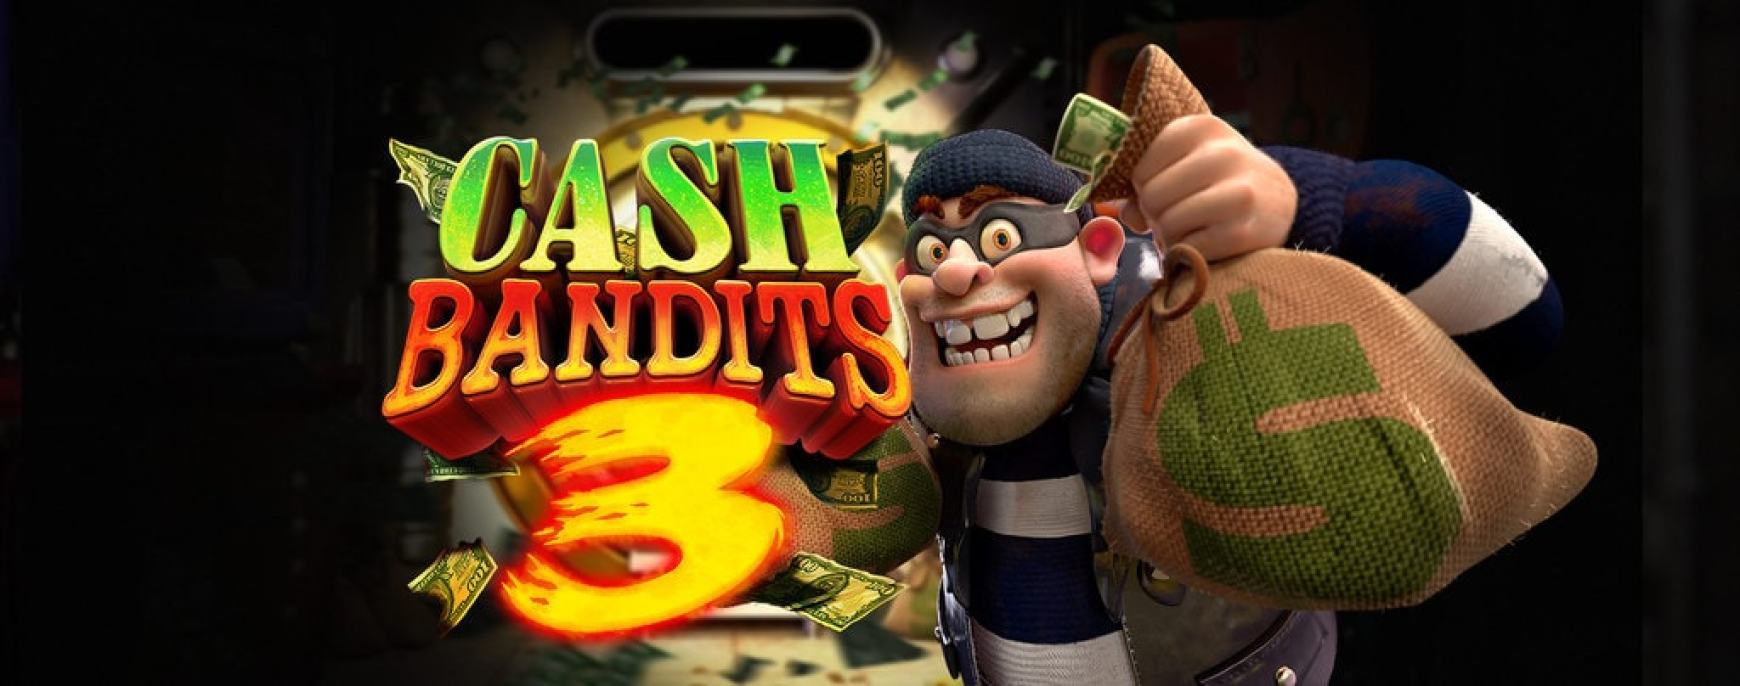 Uptown Pokies RTG Cash Bandits 3